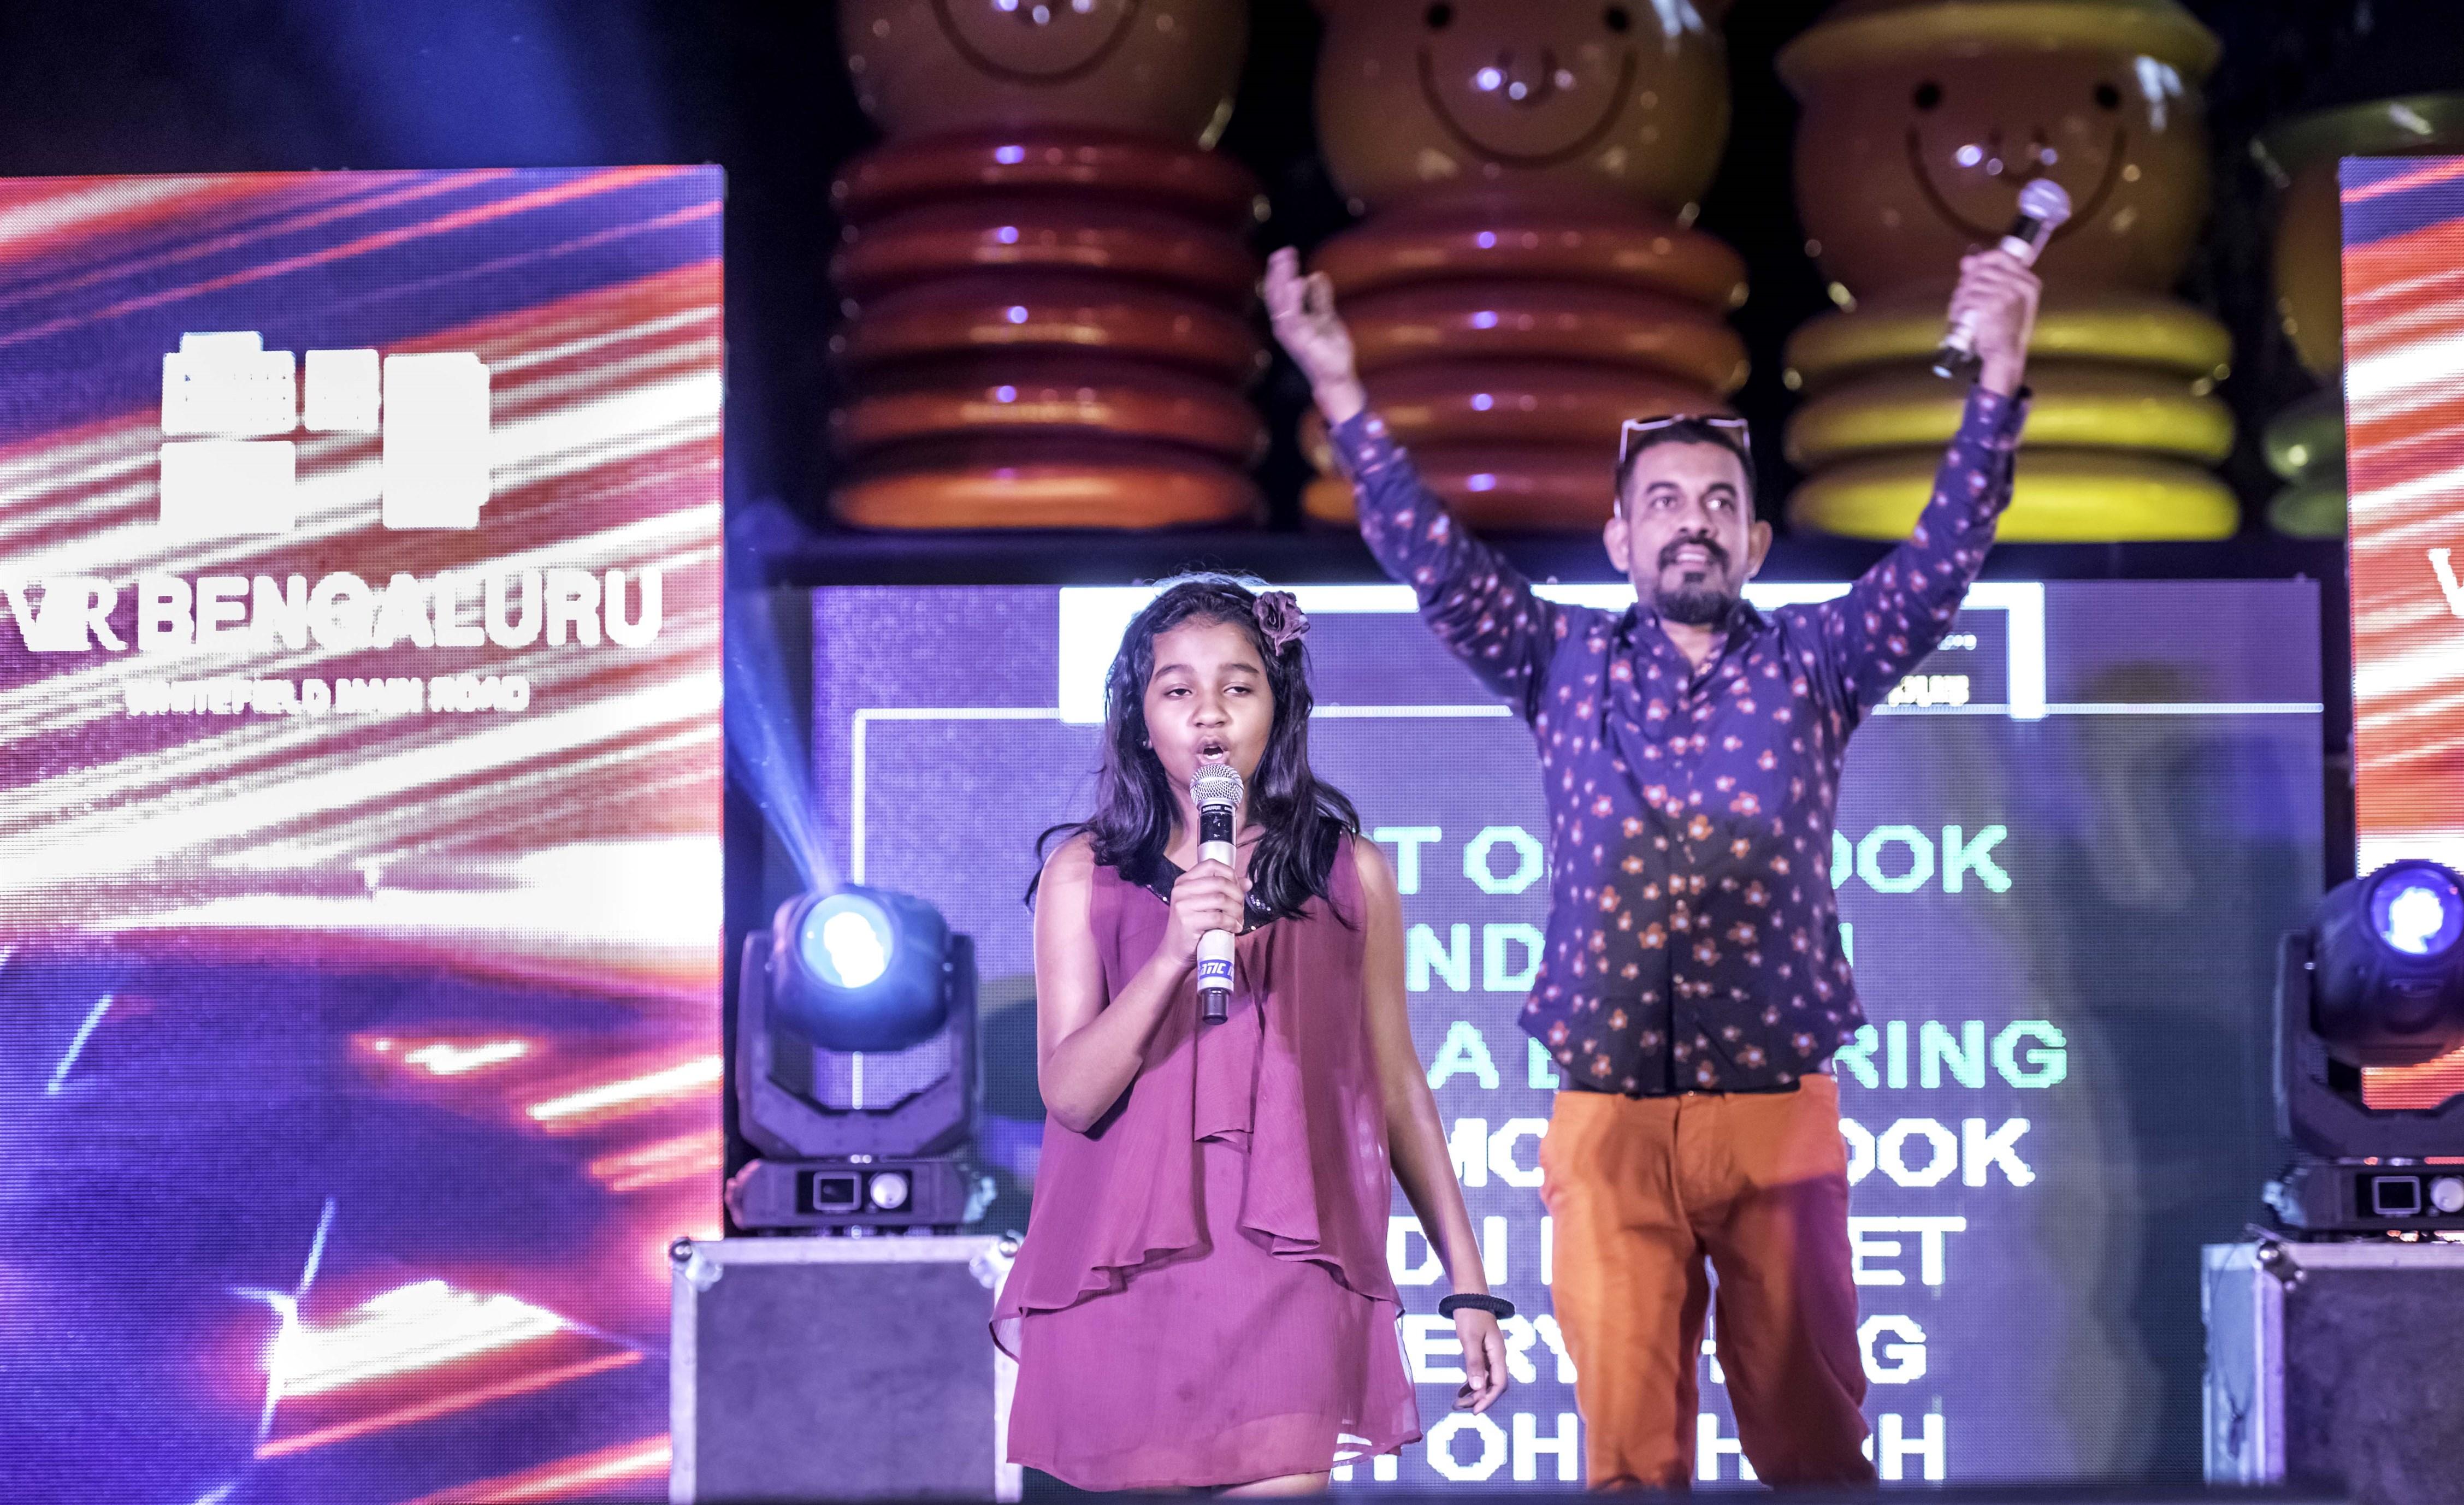 VR Bengaluru - Karaoke 1 the jeromy diaries(4511 x 2756)